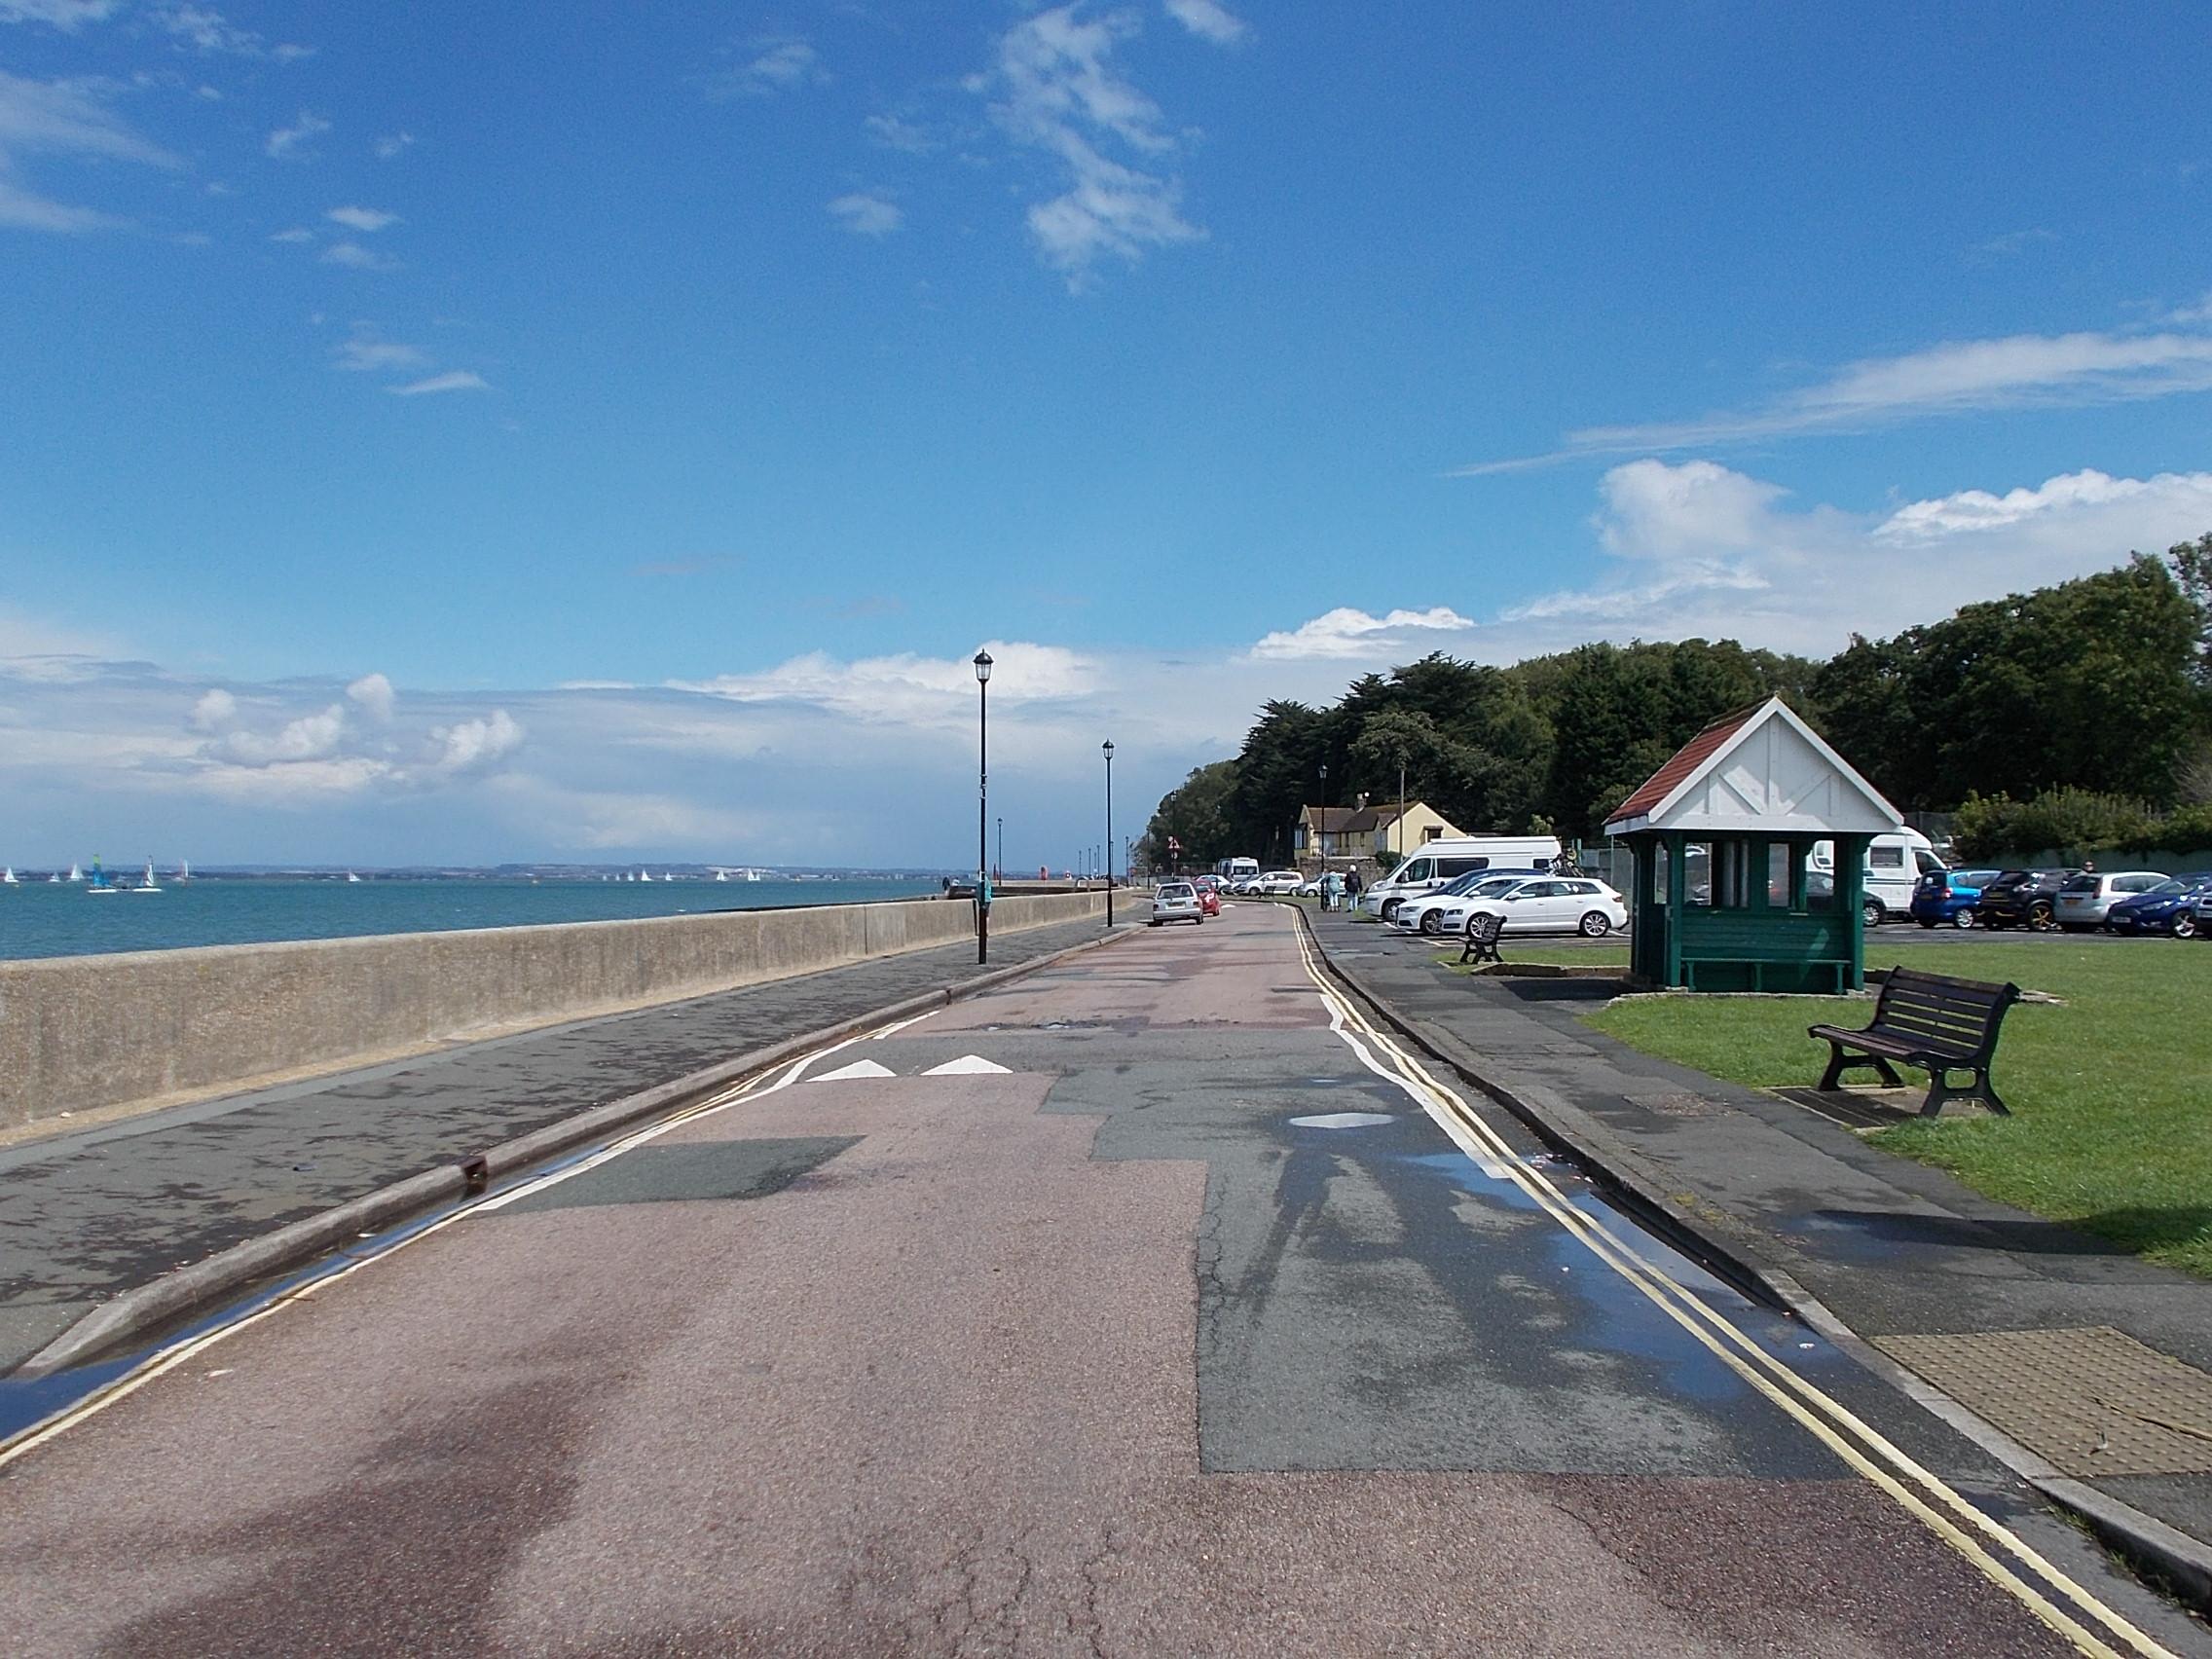 File:Esplanade, East Cowes, IW, UK.jpg - Wikimedia Commons